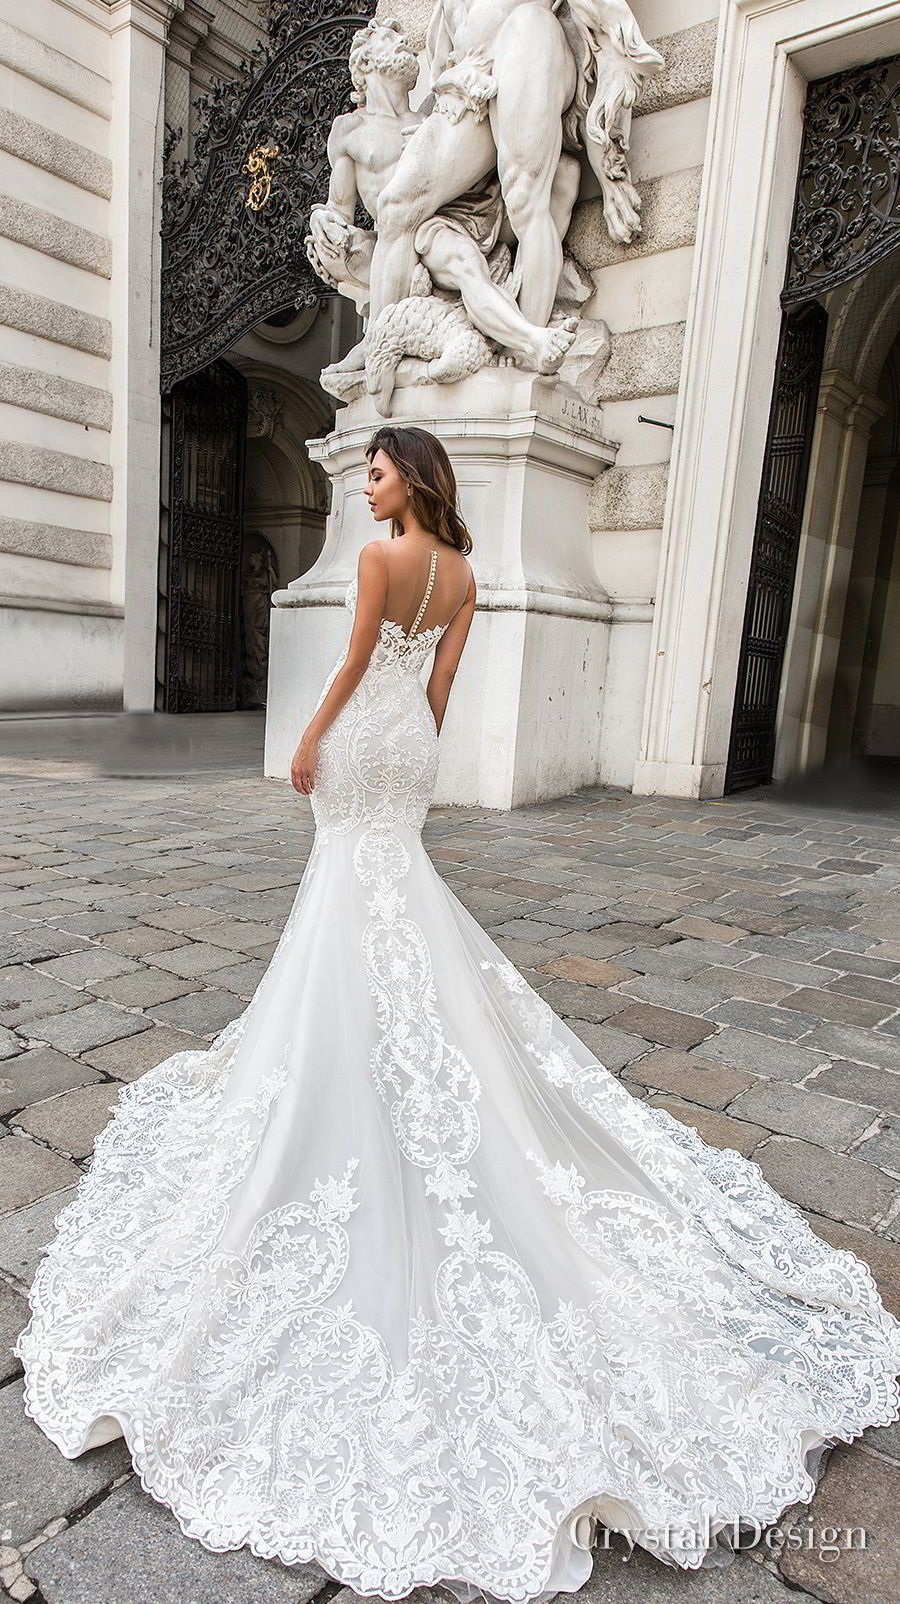 Crystal Design 2018 Wedding Dresses Royal Garden Haute Couture Bridal Collections Wedding Inspirasi Wedding Dresses Sheer Wedding Dress Designer Wedding Dresses [ 1604 x 900 Pixel ]